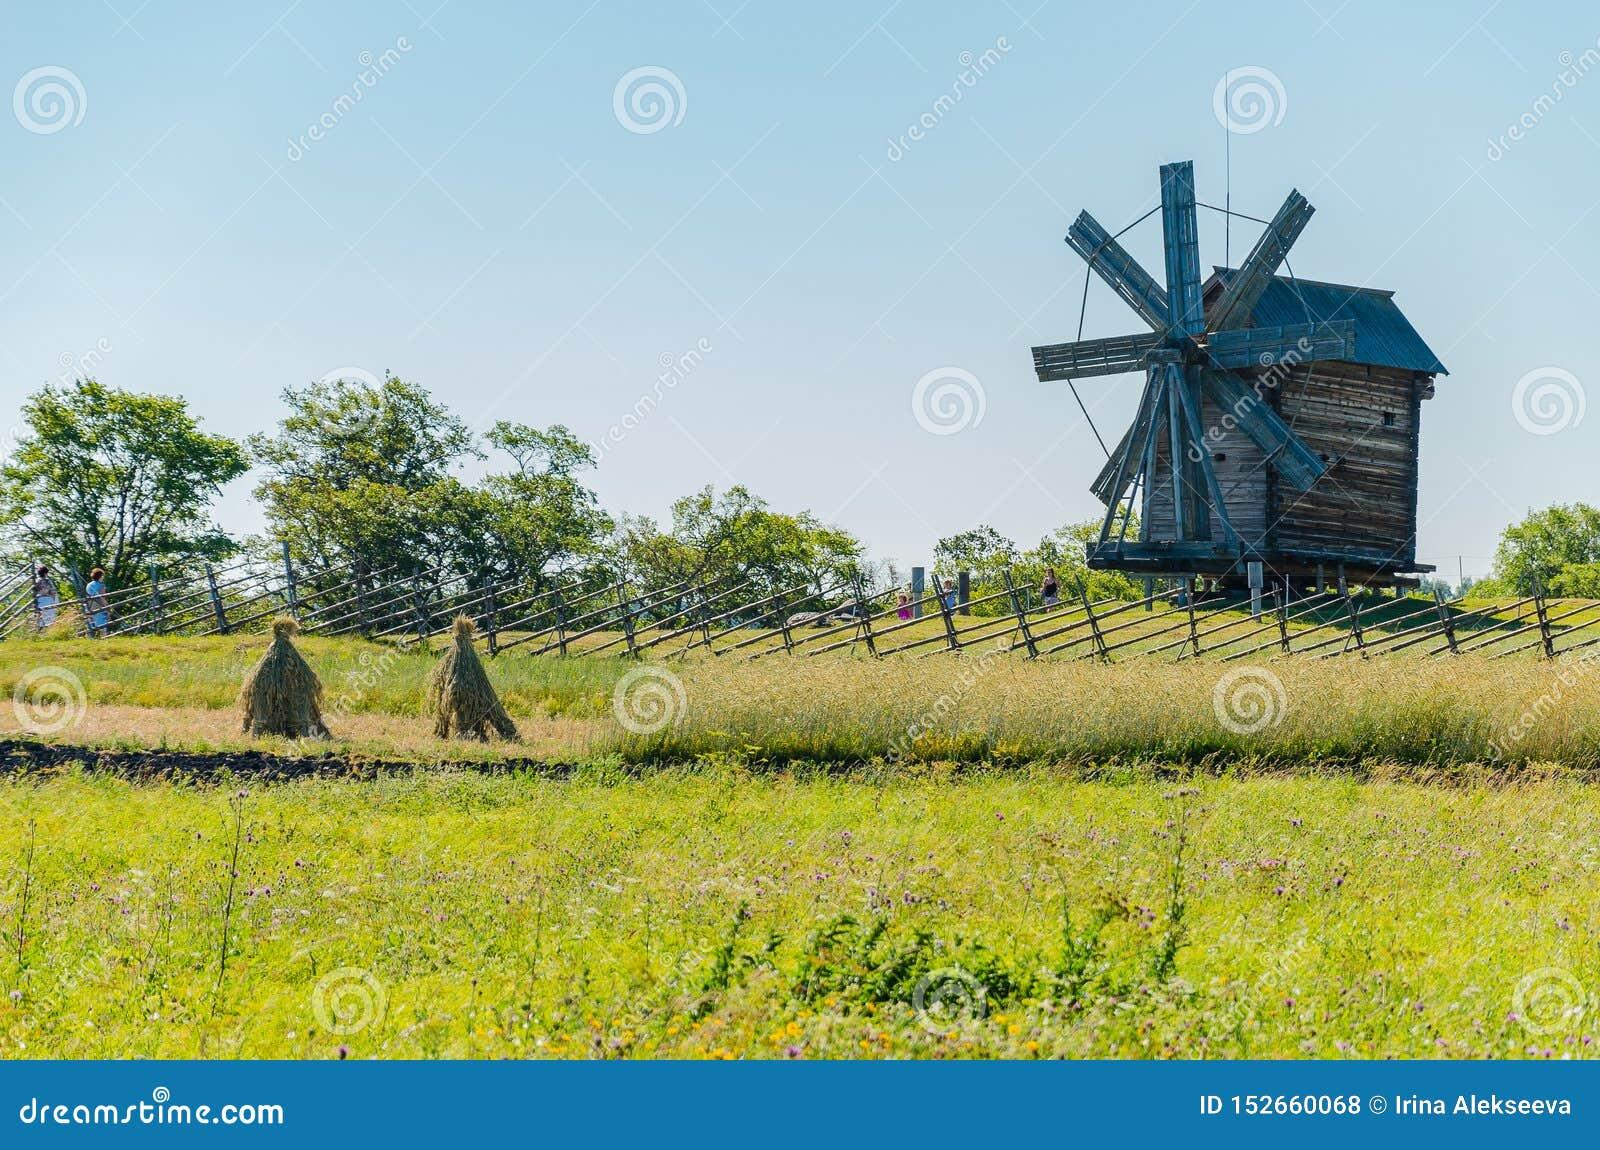 Kizhi Island, Russia - 07.19.2018 -: Old wooden mill. Rural landscape